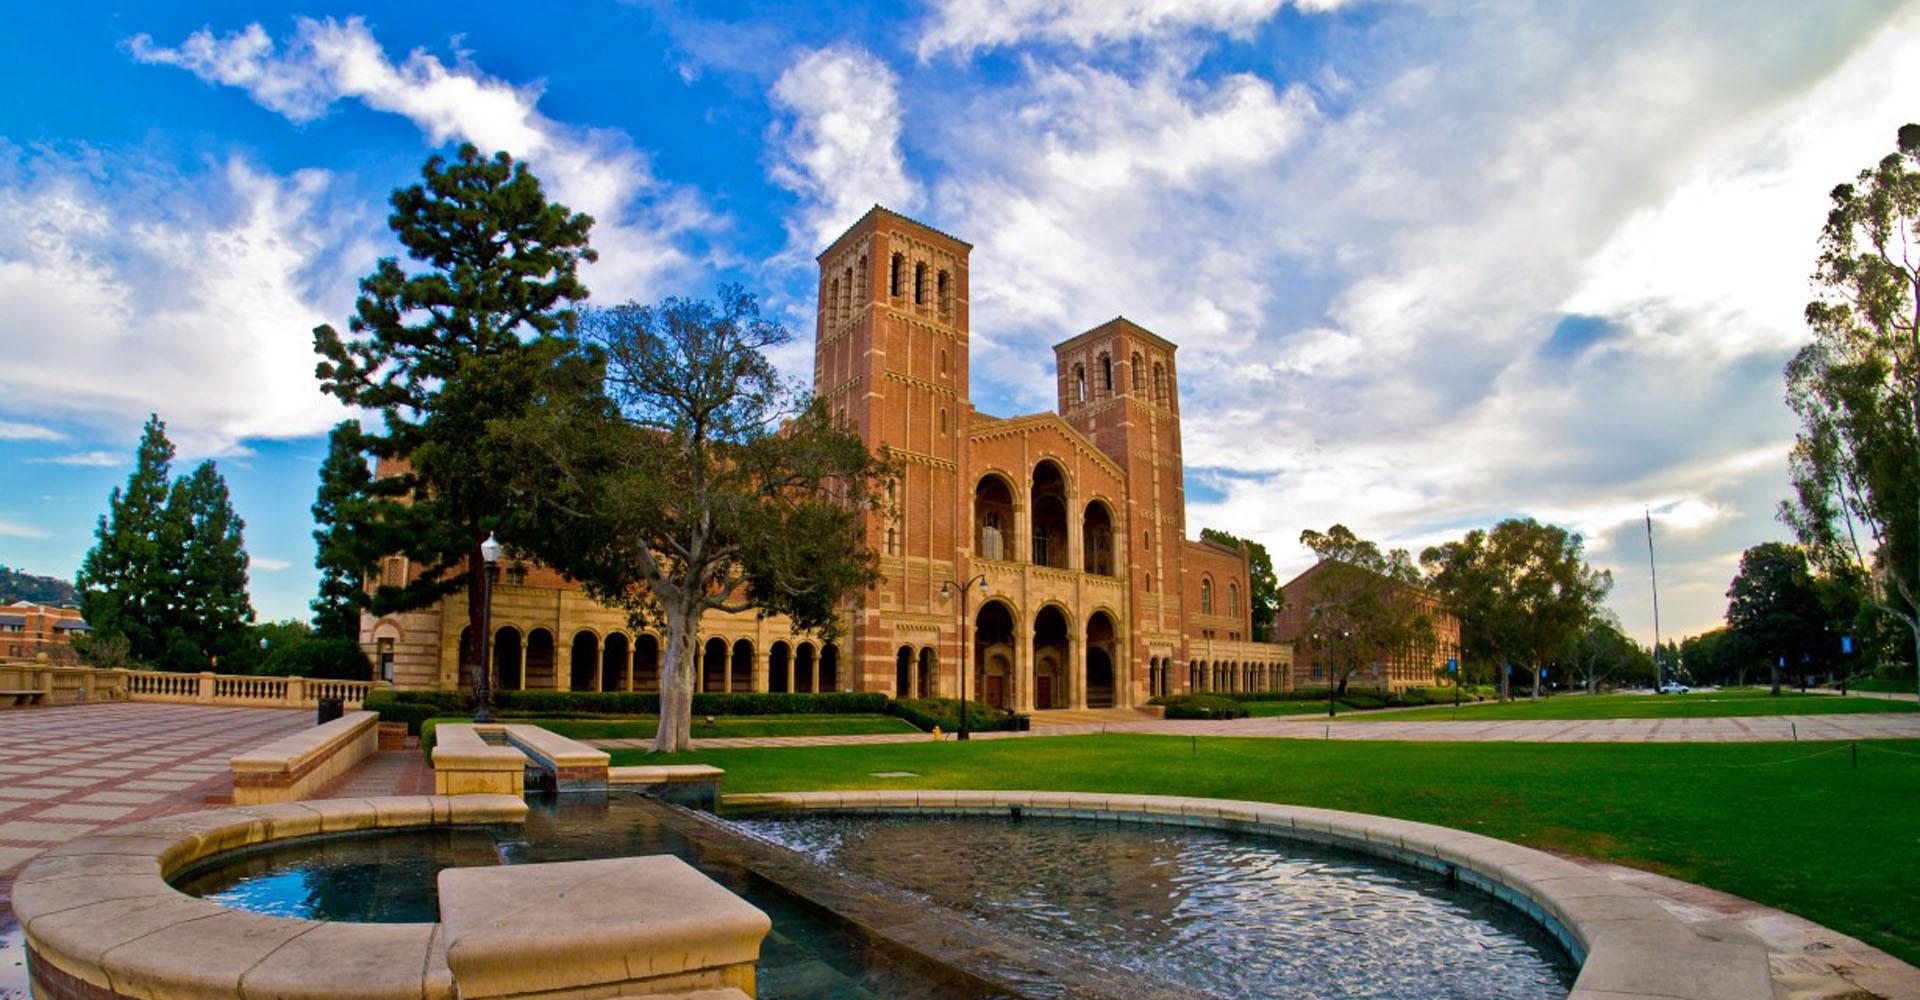 university of california essay prompts  tips tricks and ideas  university of california essay prompts  tips tricks and ideas